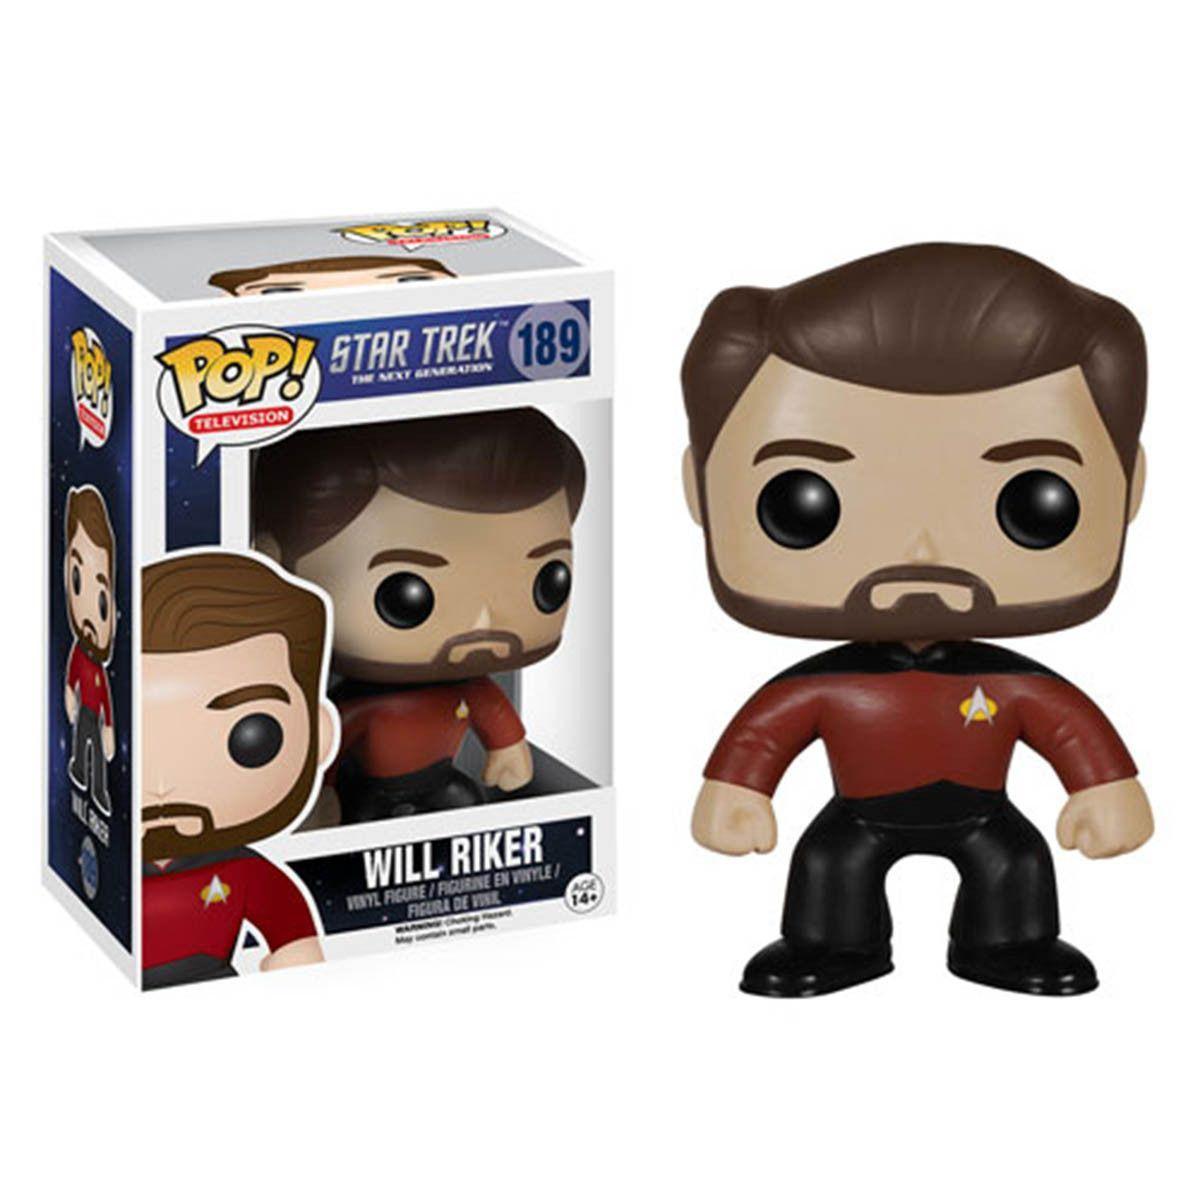 Star Trek The Next Generation Pop Will Riker Vinyl Figure